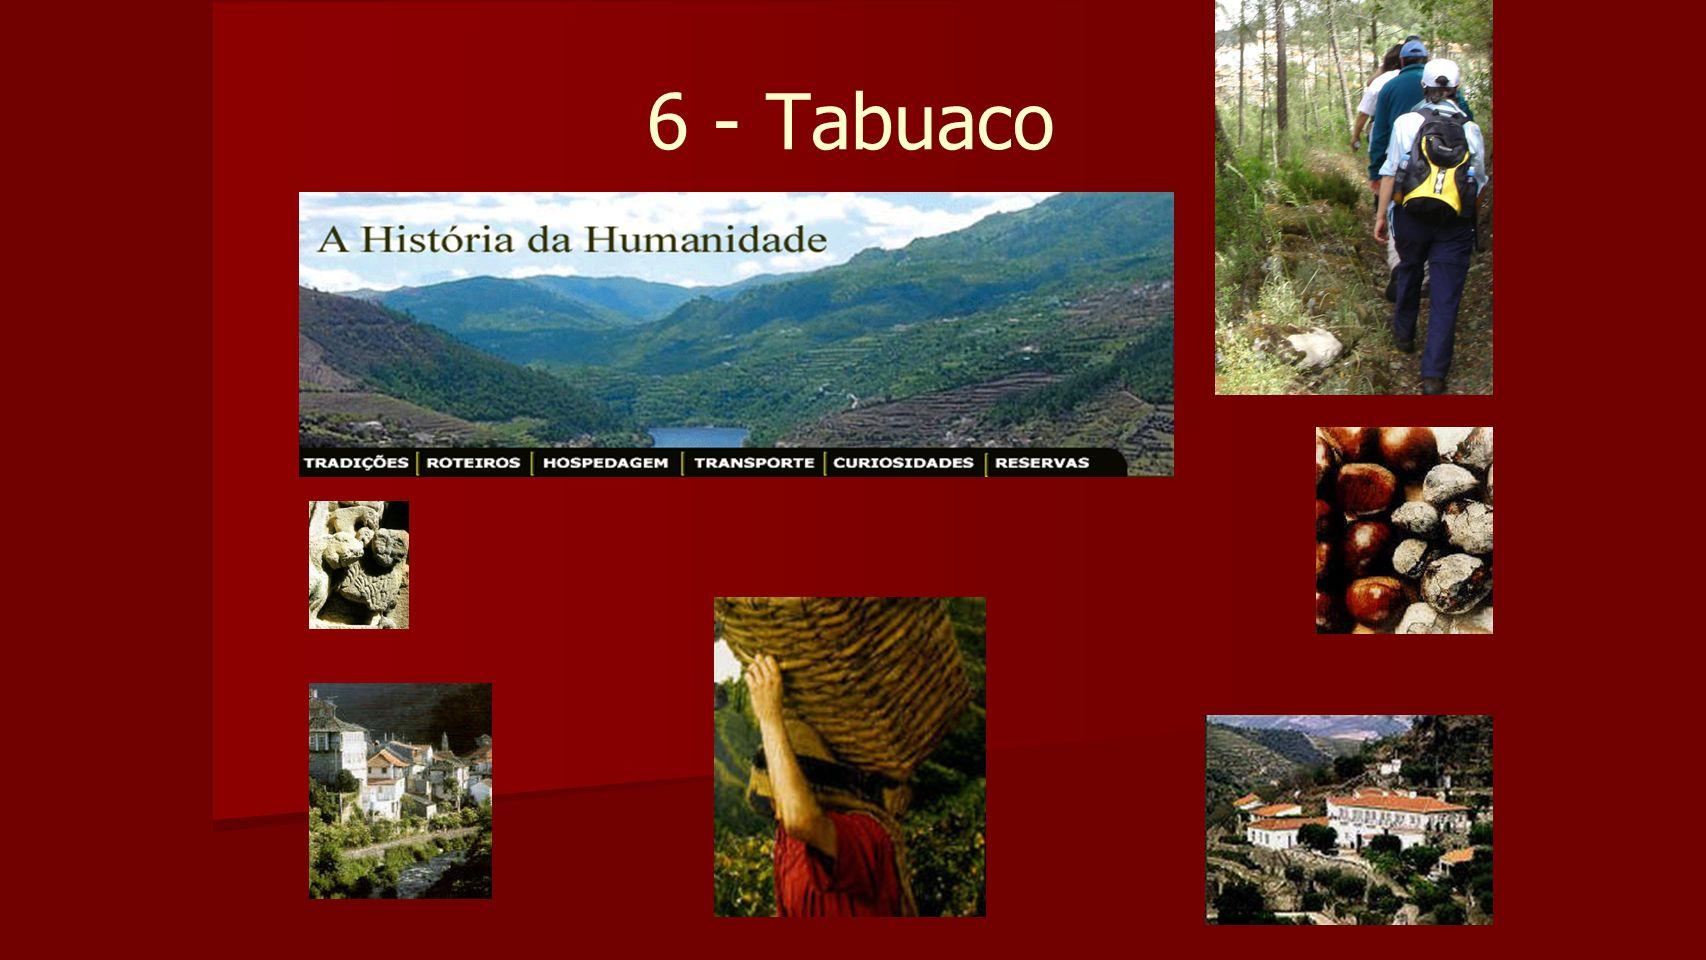 6 - Tabuaco